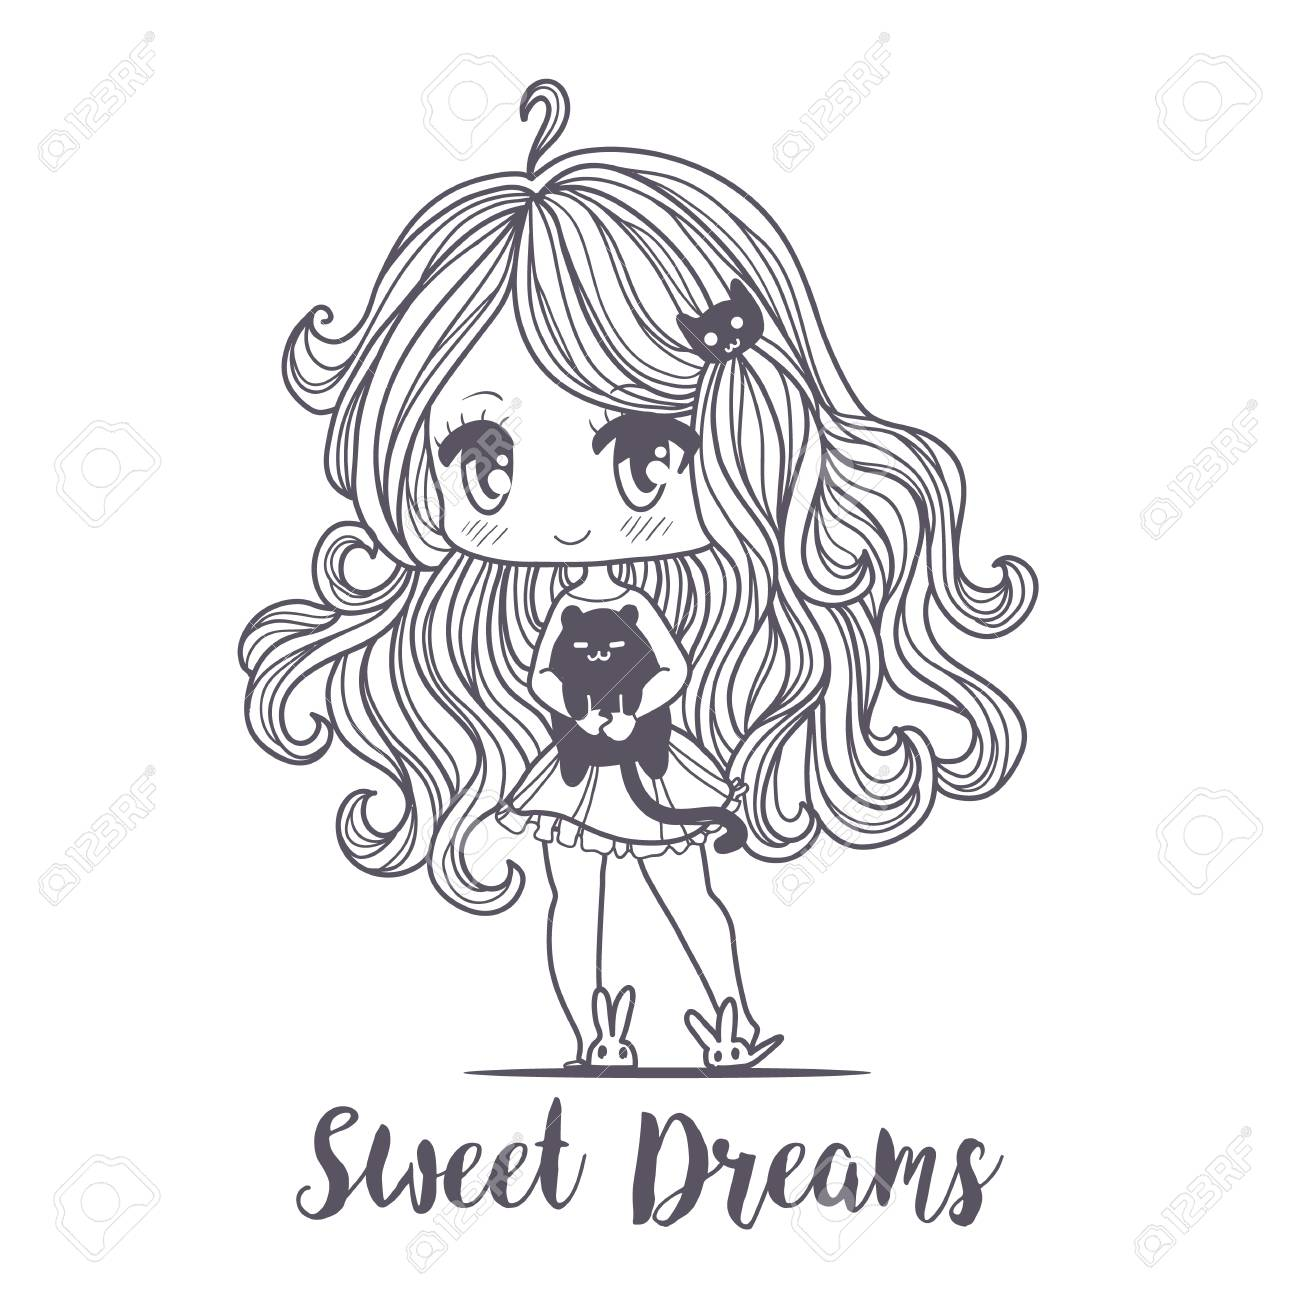 Cute Vector Illustration Kawaii Anime Girl Big Eyes Use For